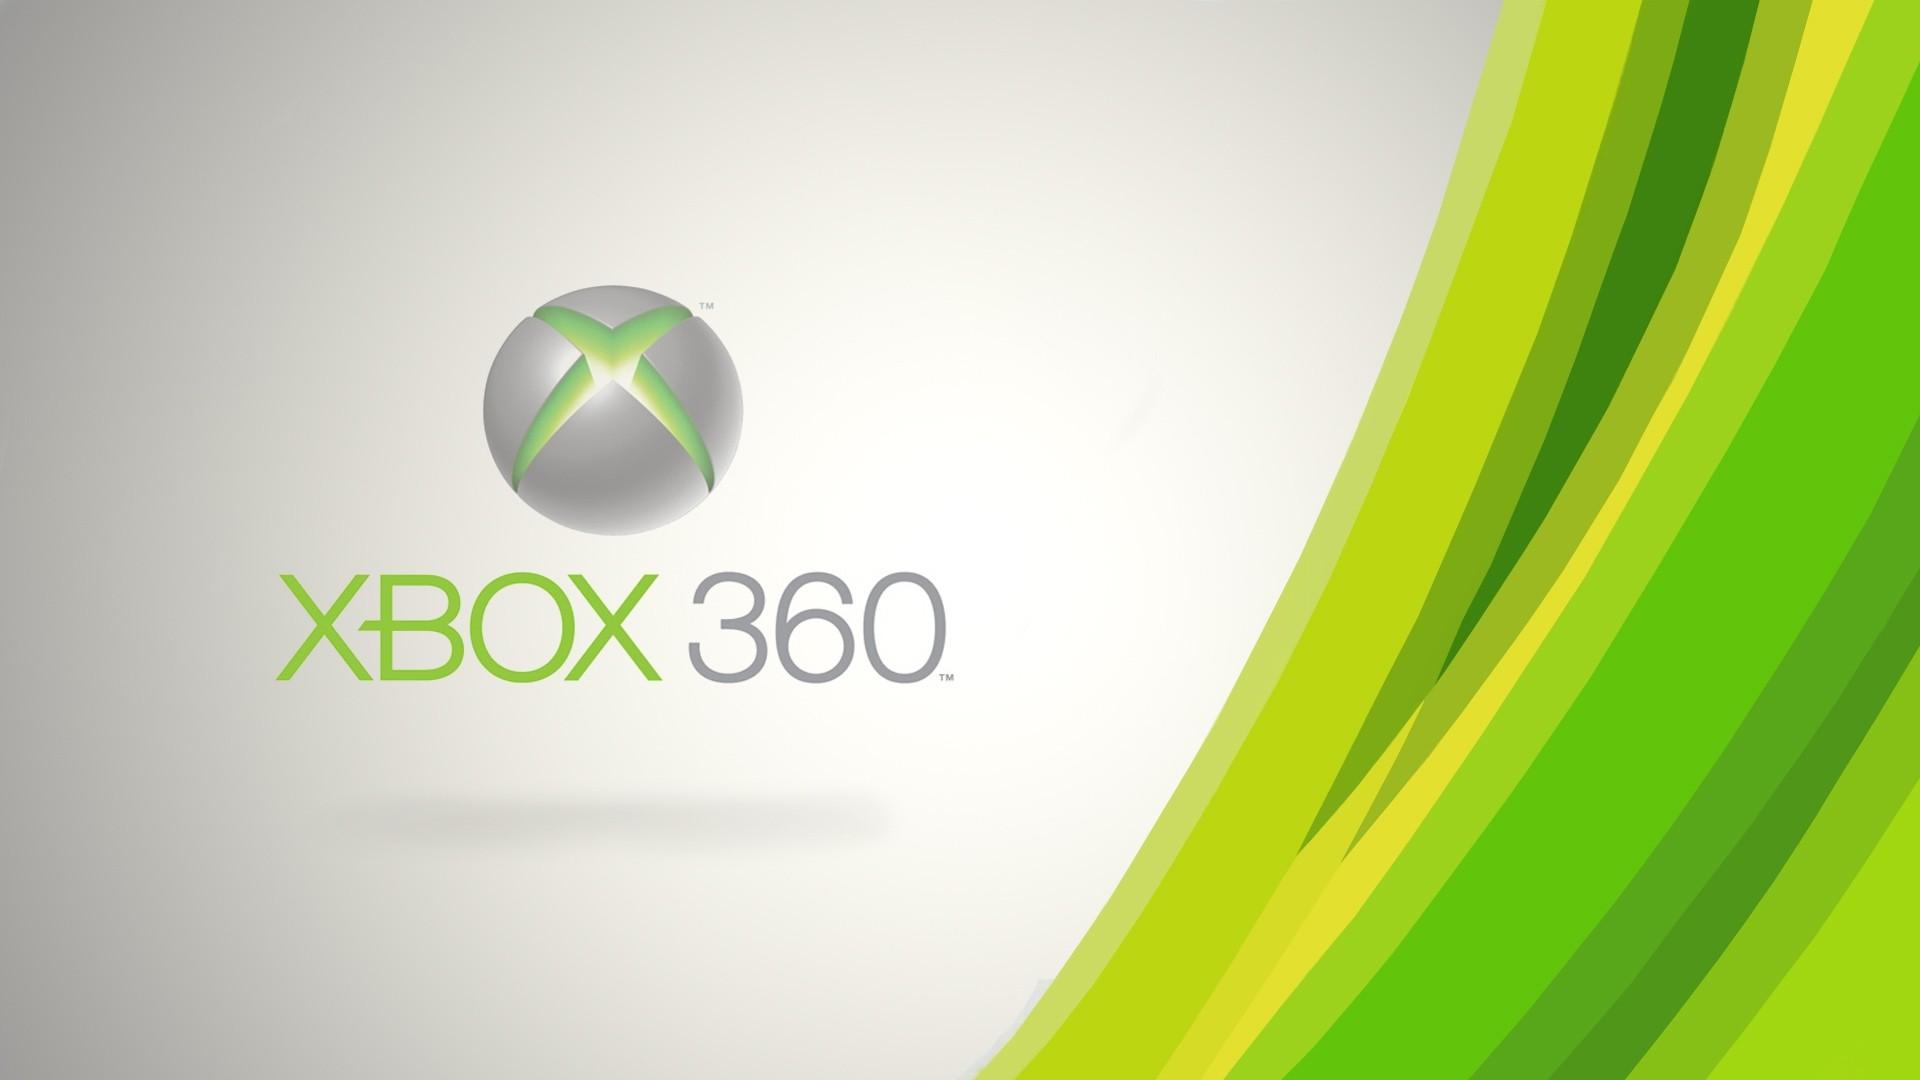 Video-Games-Console-Xbox-360-360-Box-Fresh- Hd Xbox 360 1920x1080